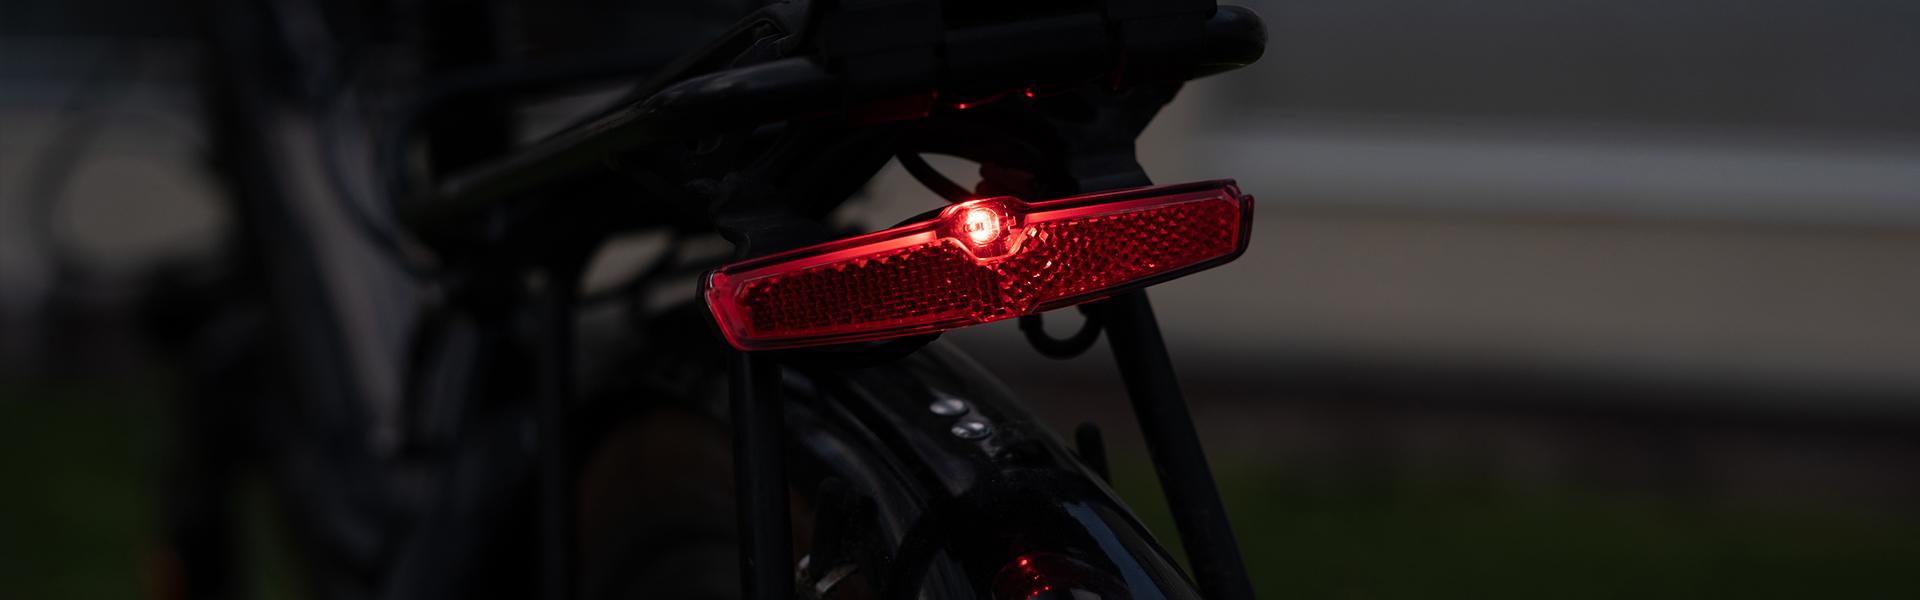 Sate-lite 50 LUX USB rechargeable bike light StVZO eletric bike front light CREE LED waterproof